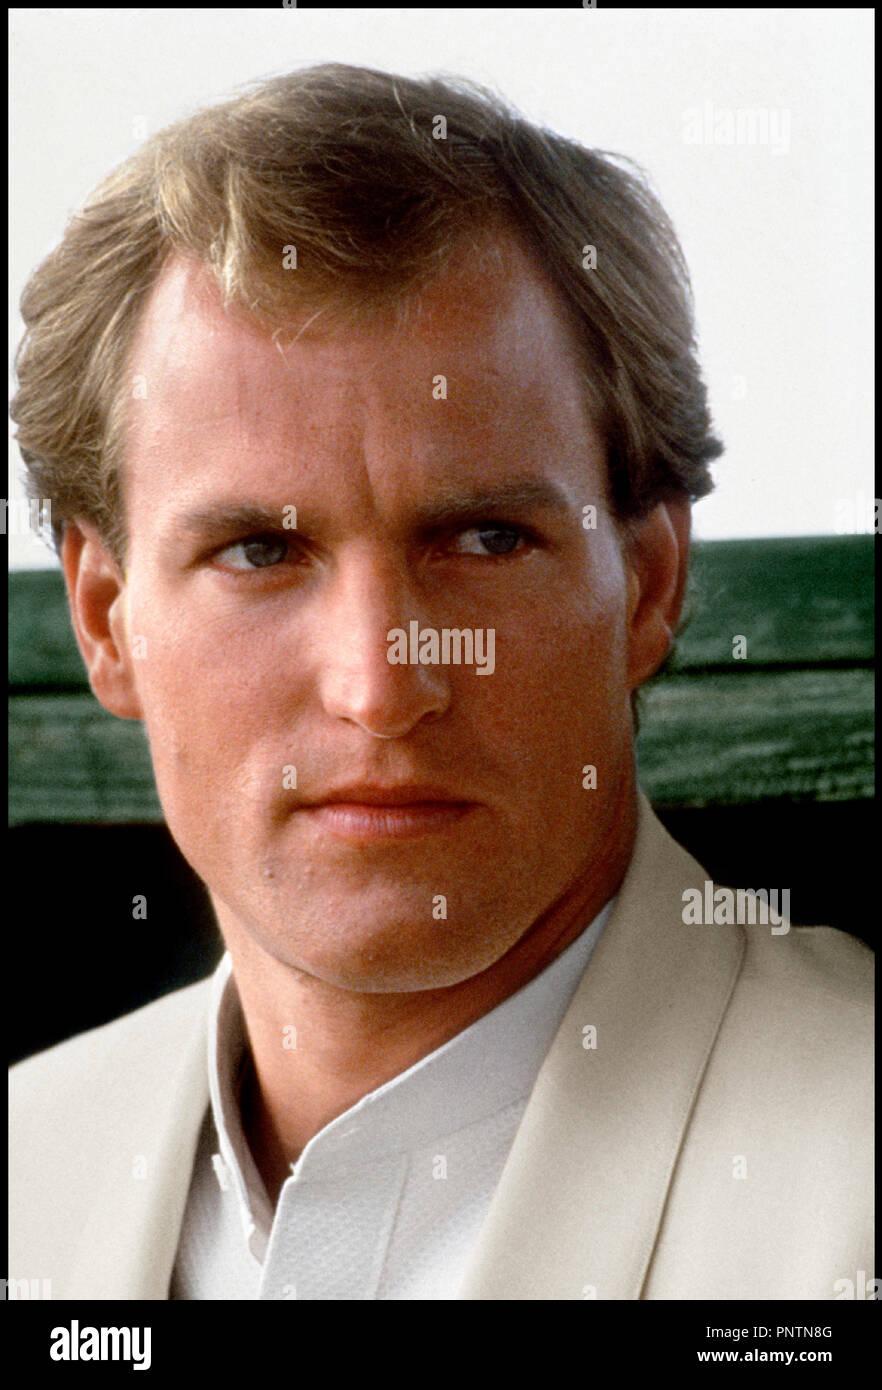 Prod DB ©ÊParamount / DR PROPOSITION INDECENTE (INDECENT PROPOSAL) de Adrian Lyne 1993 USA avec Woody Harrelson portrait - Stock Image